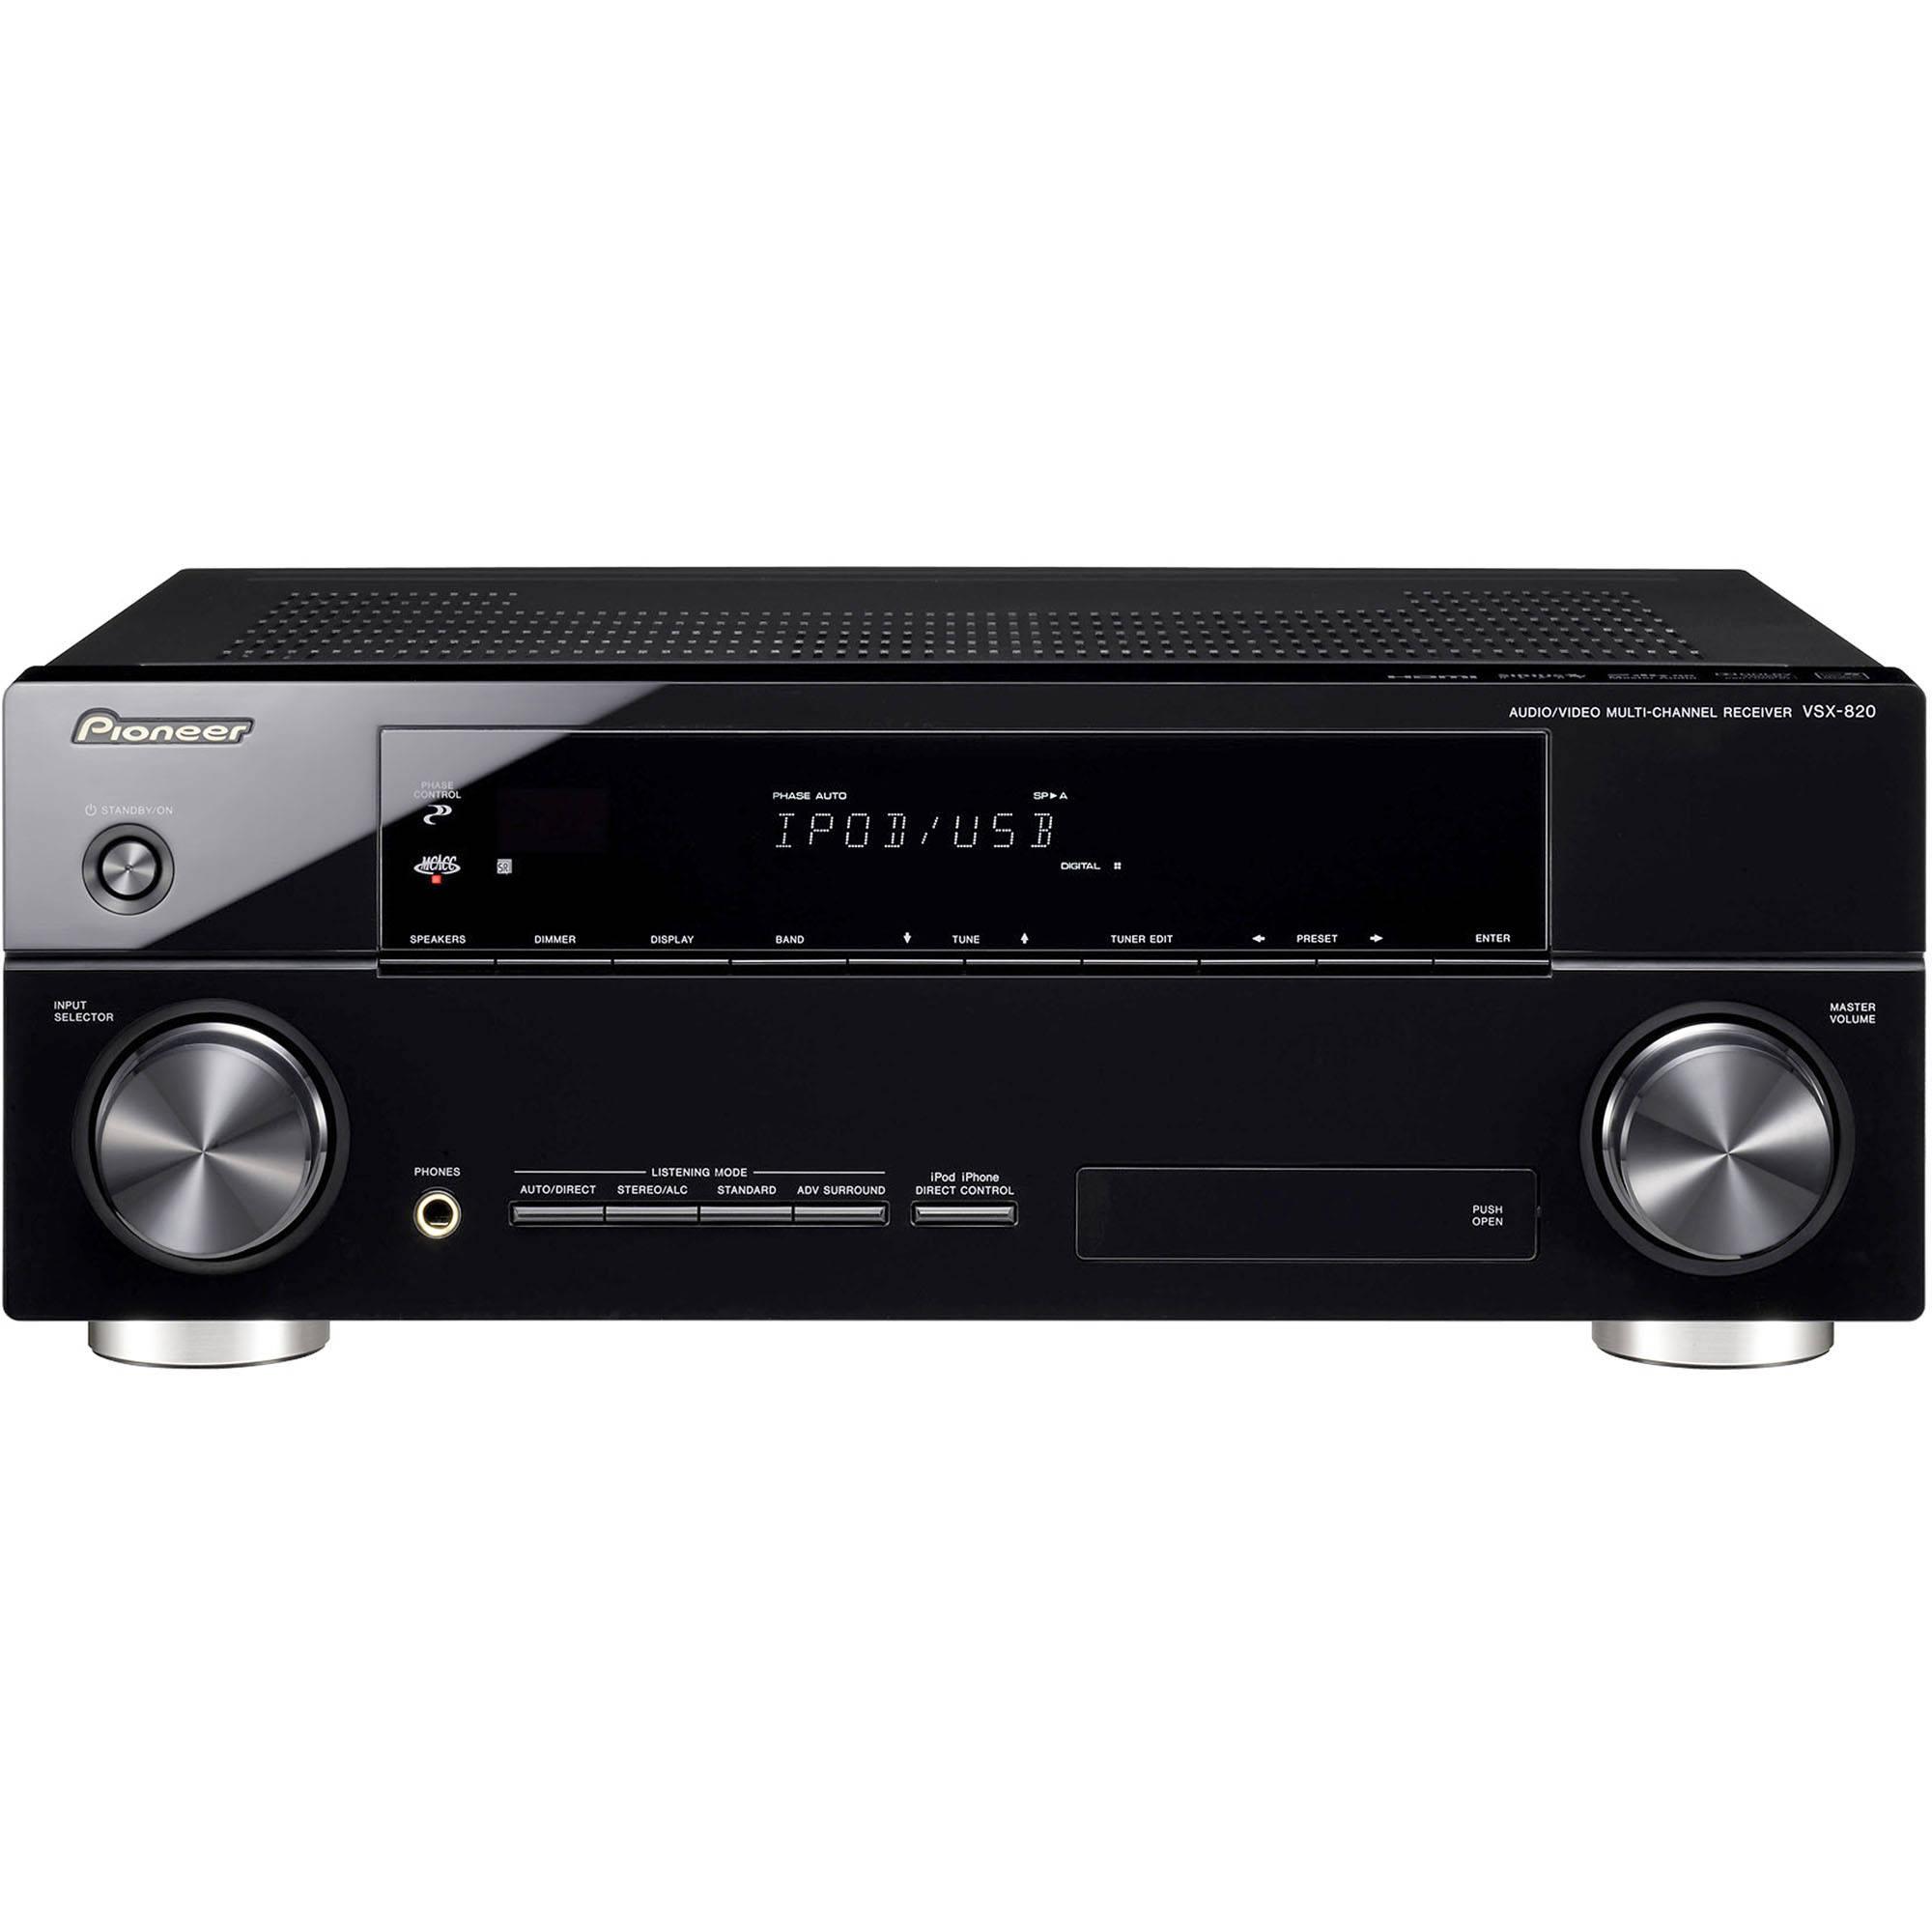 pioneer vsx 820 k 5 1 channel a v receiver vsx 820 k b h photo rh bhphotovideo com Sony 5.1 Receiver Sony STR-DE695 Specs